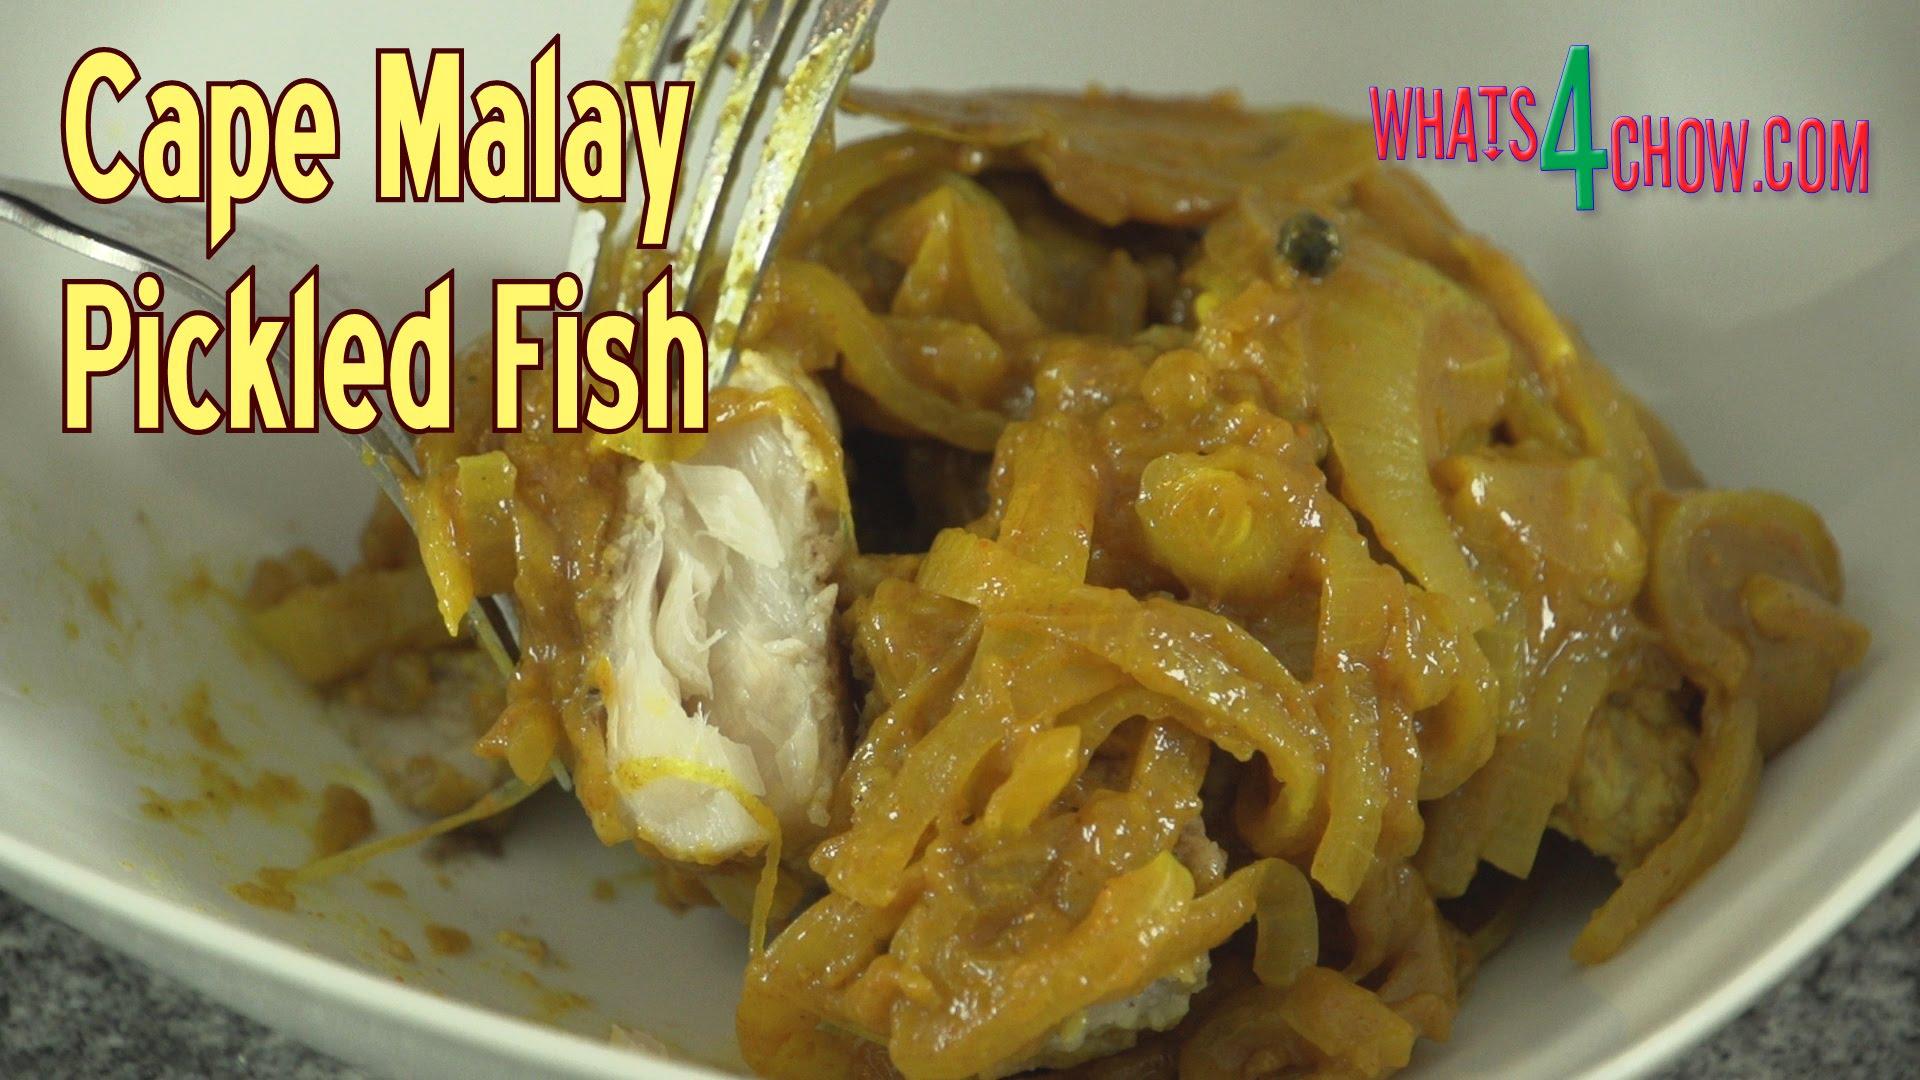 Cape Malay Pickled Fish.